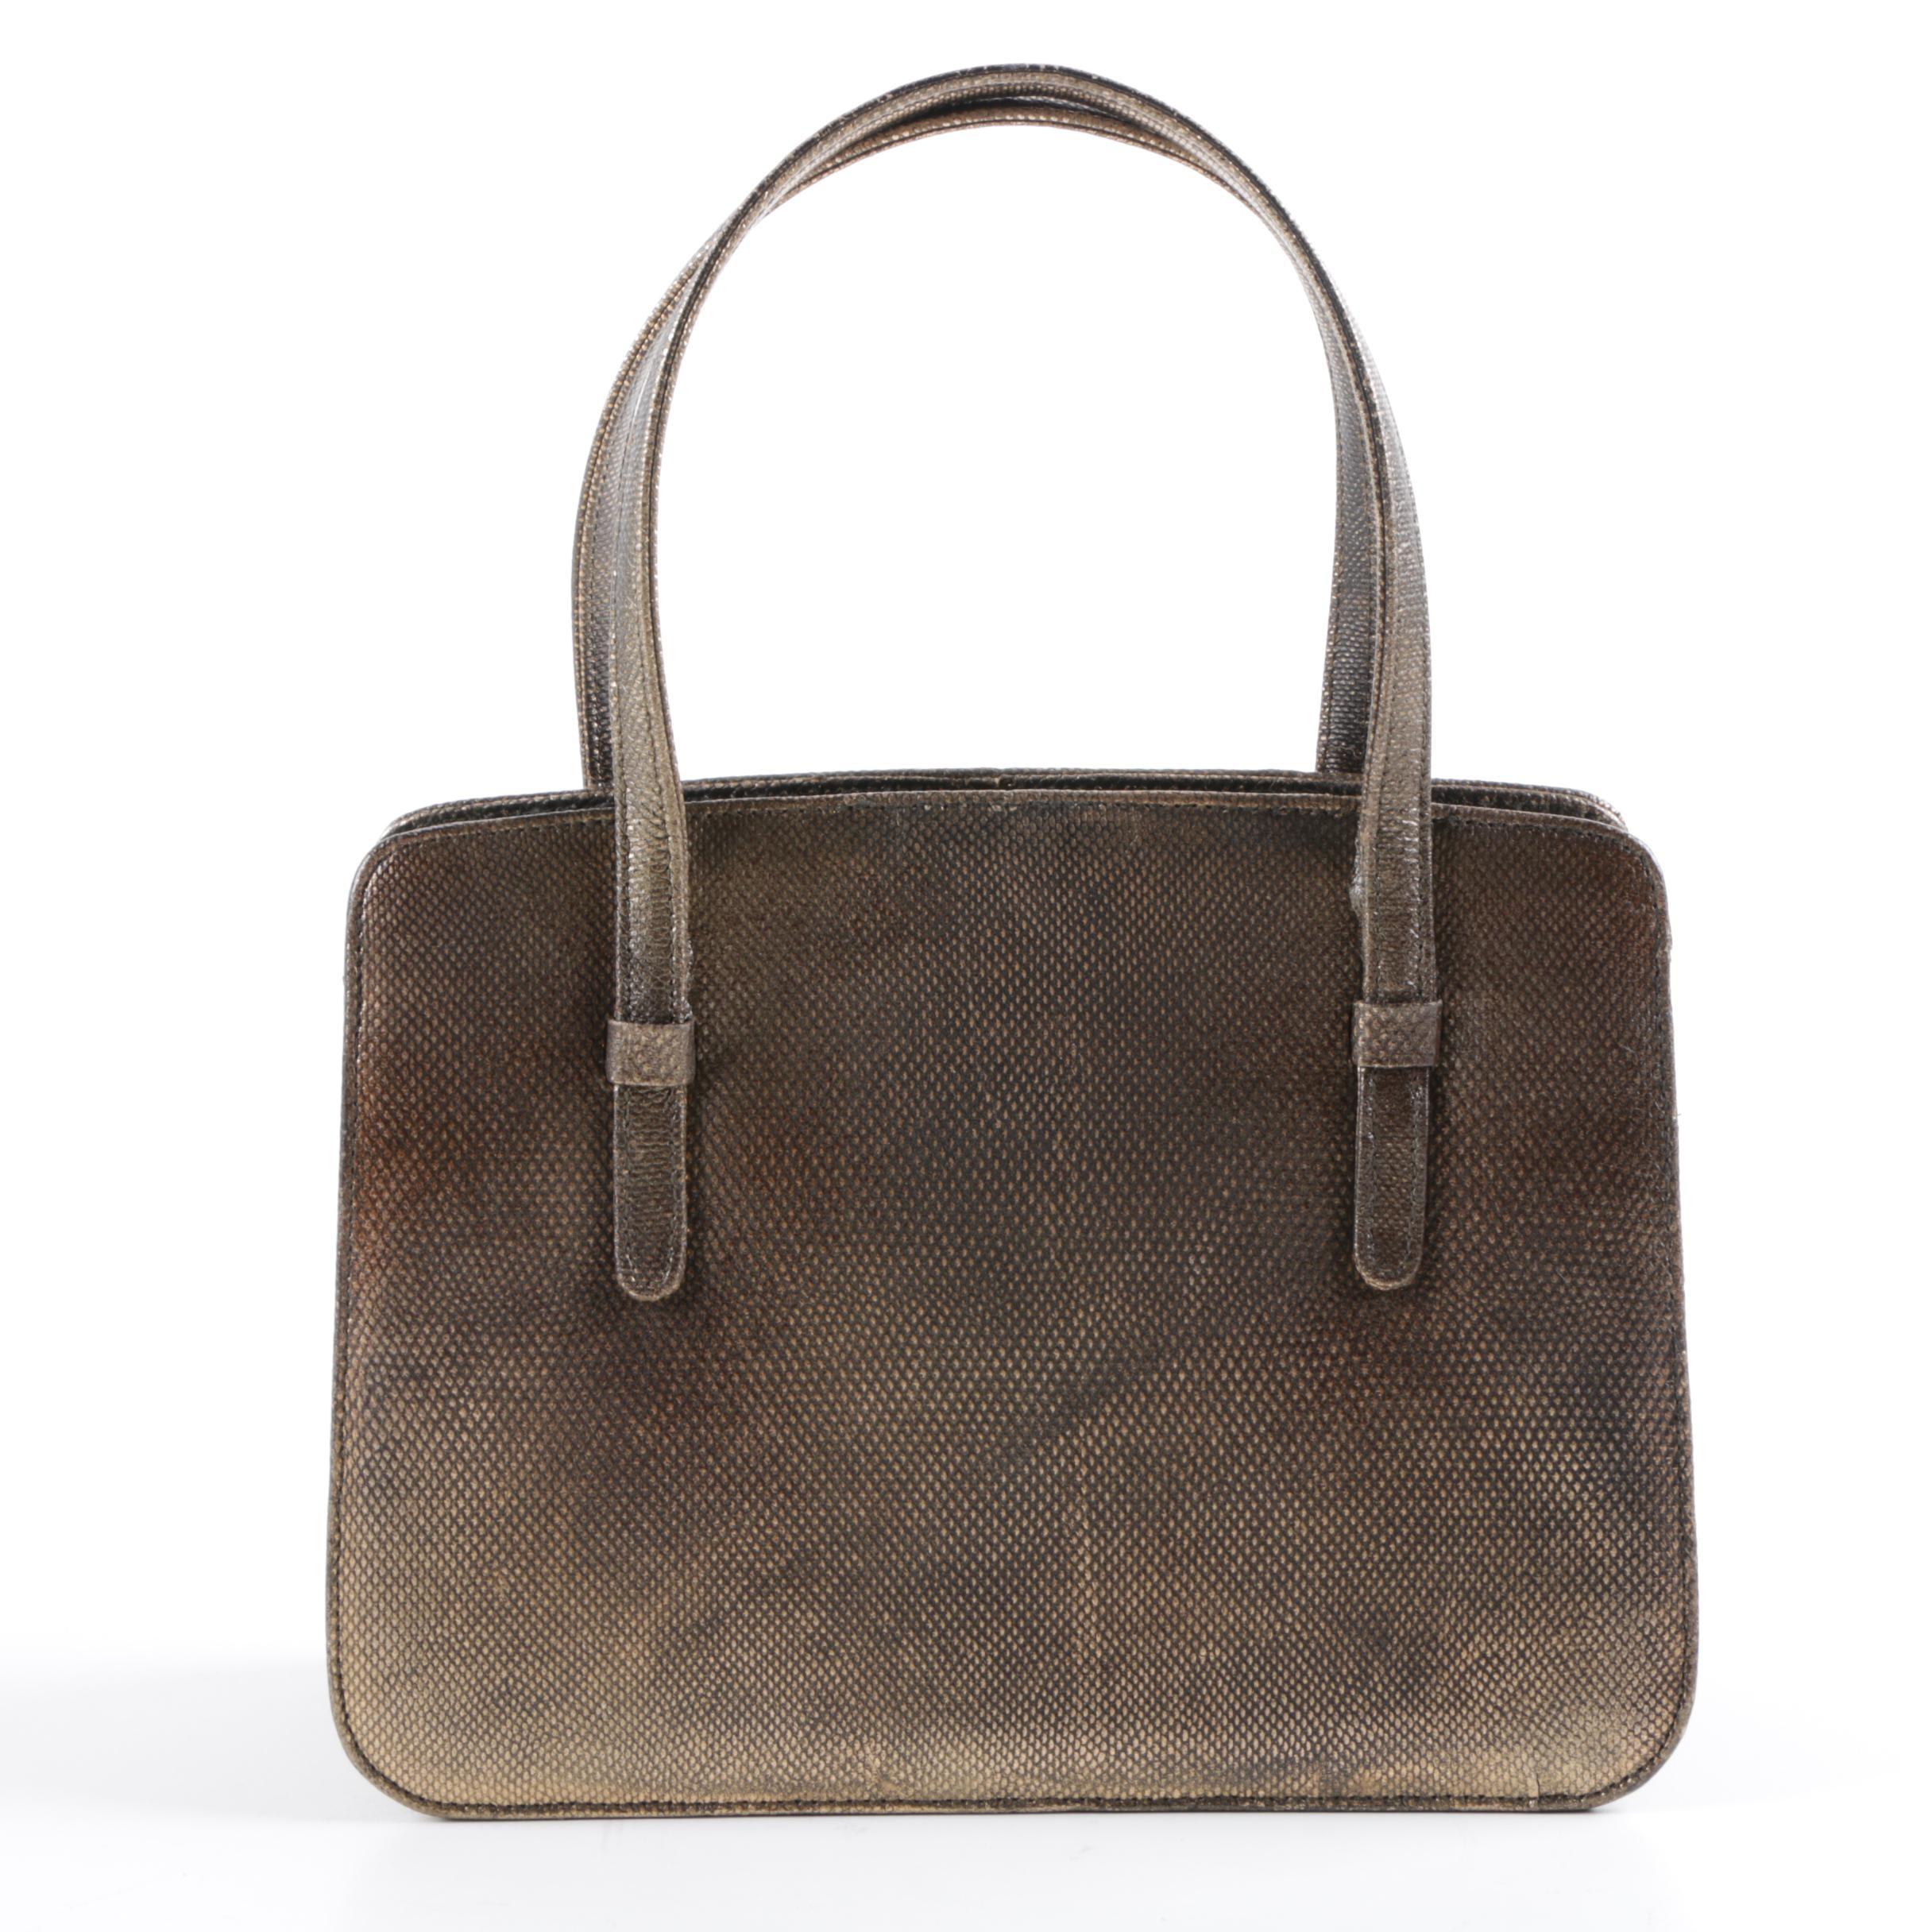 Mid-Century Lederer de Paris Copper Reptile Skin Embossed Leather Handbag